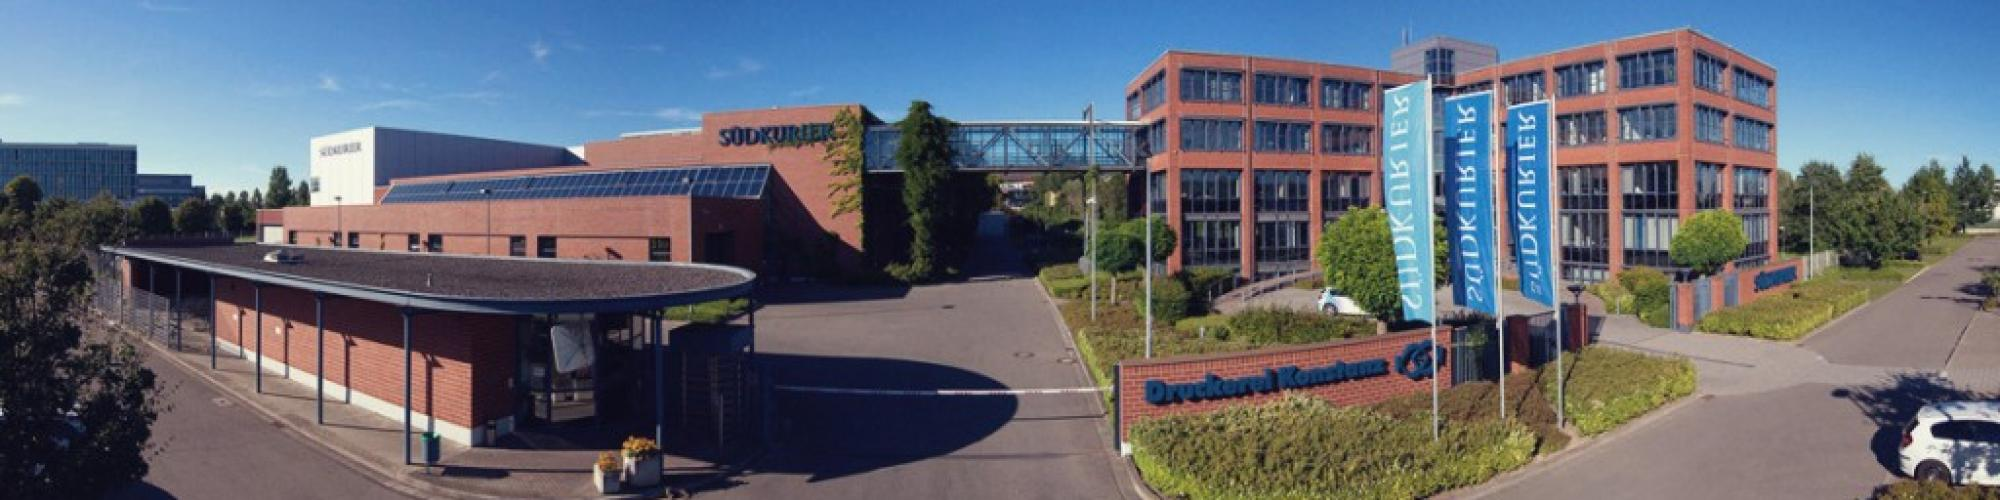 SÜDKURIER GmbH